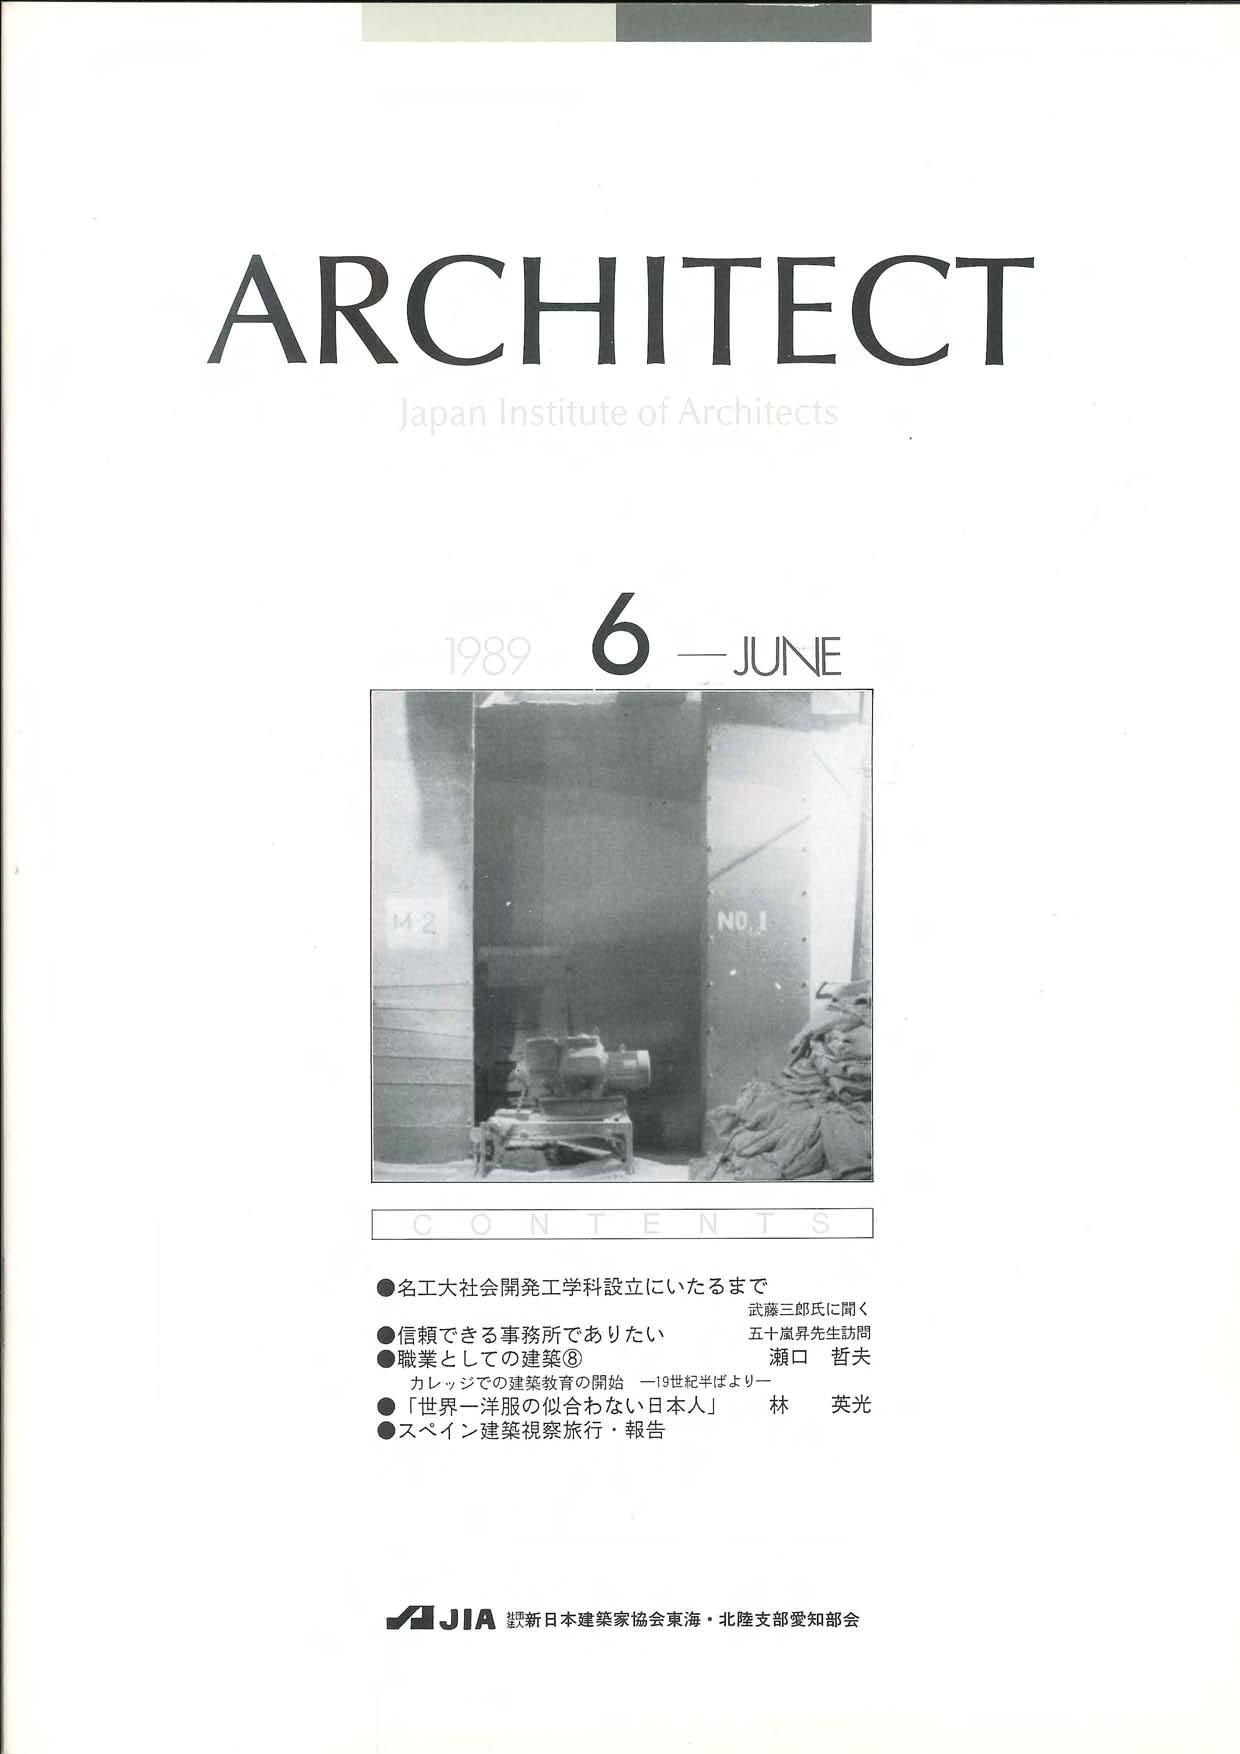 1989年6月